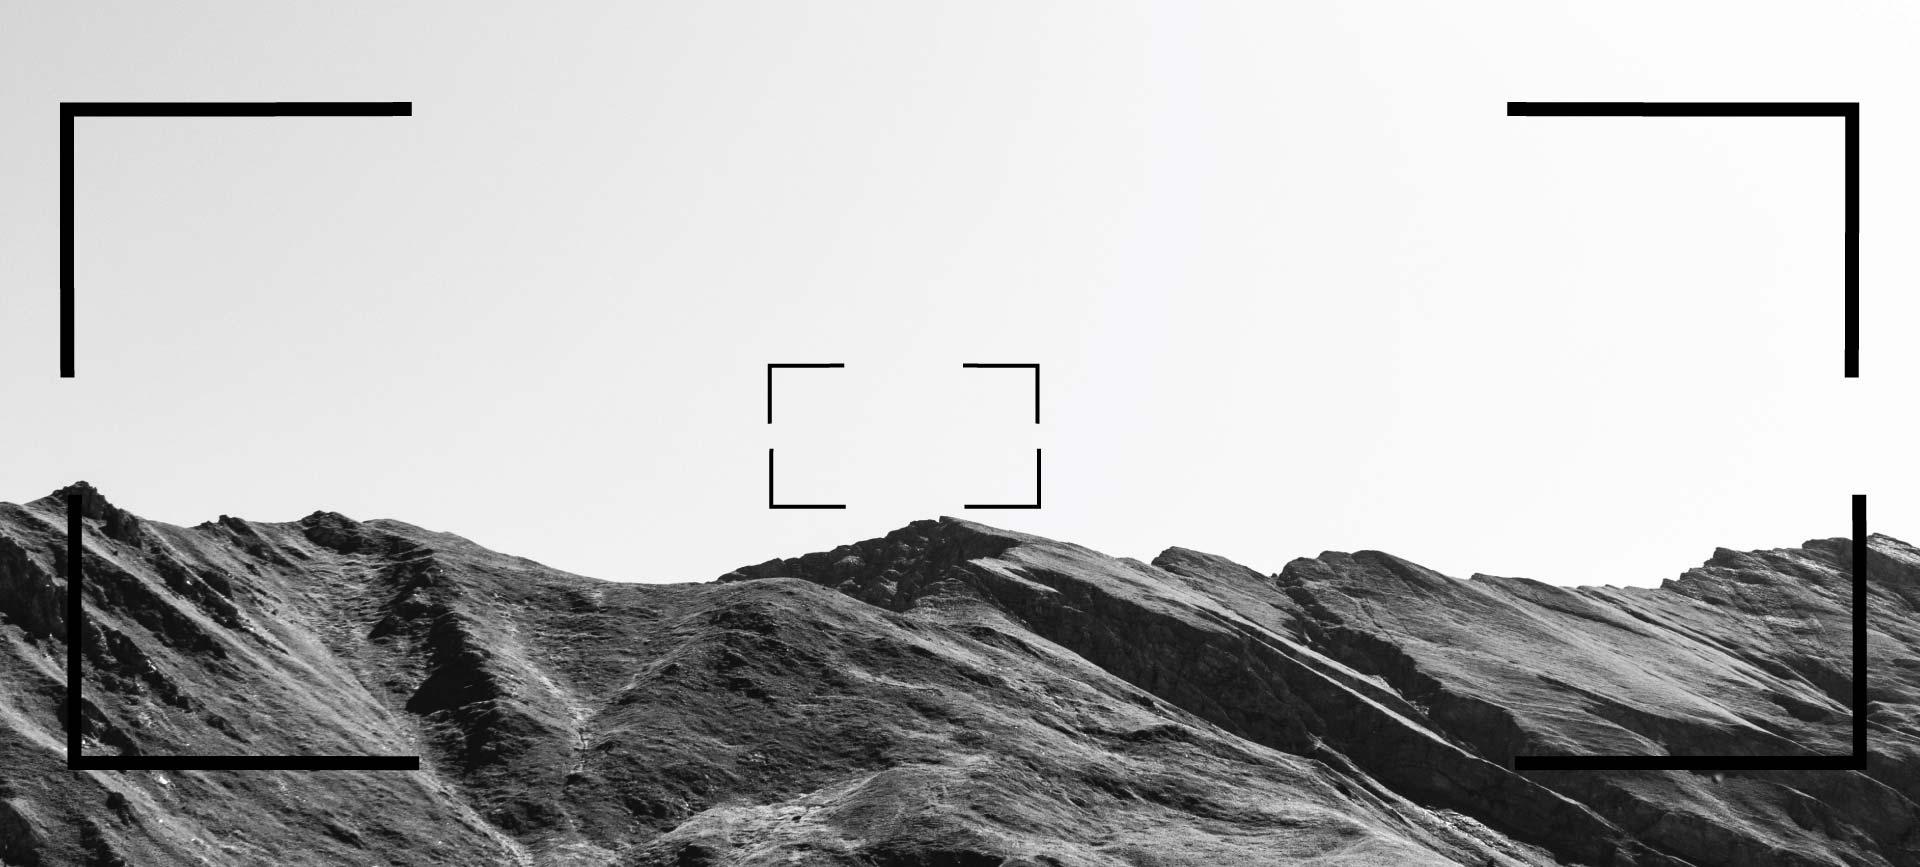 Space in photography compostion - عناصر ترکیب بندی در عکاسی